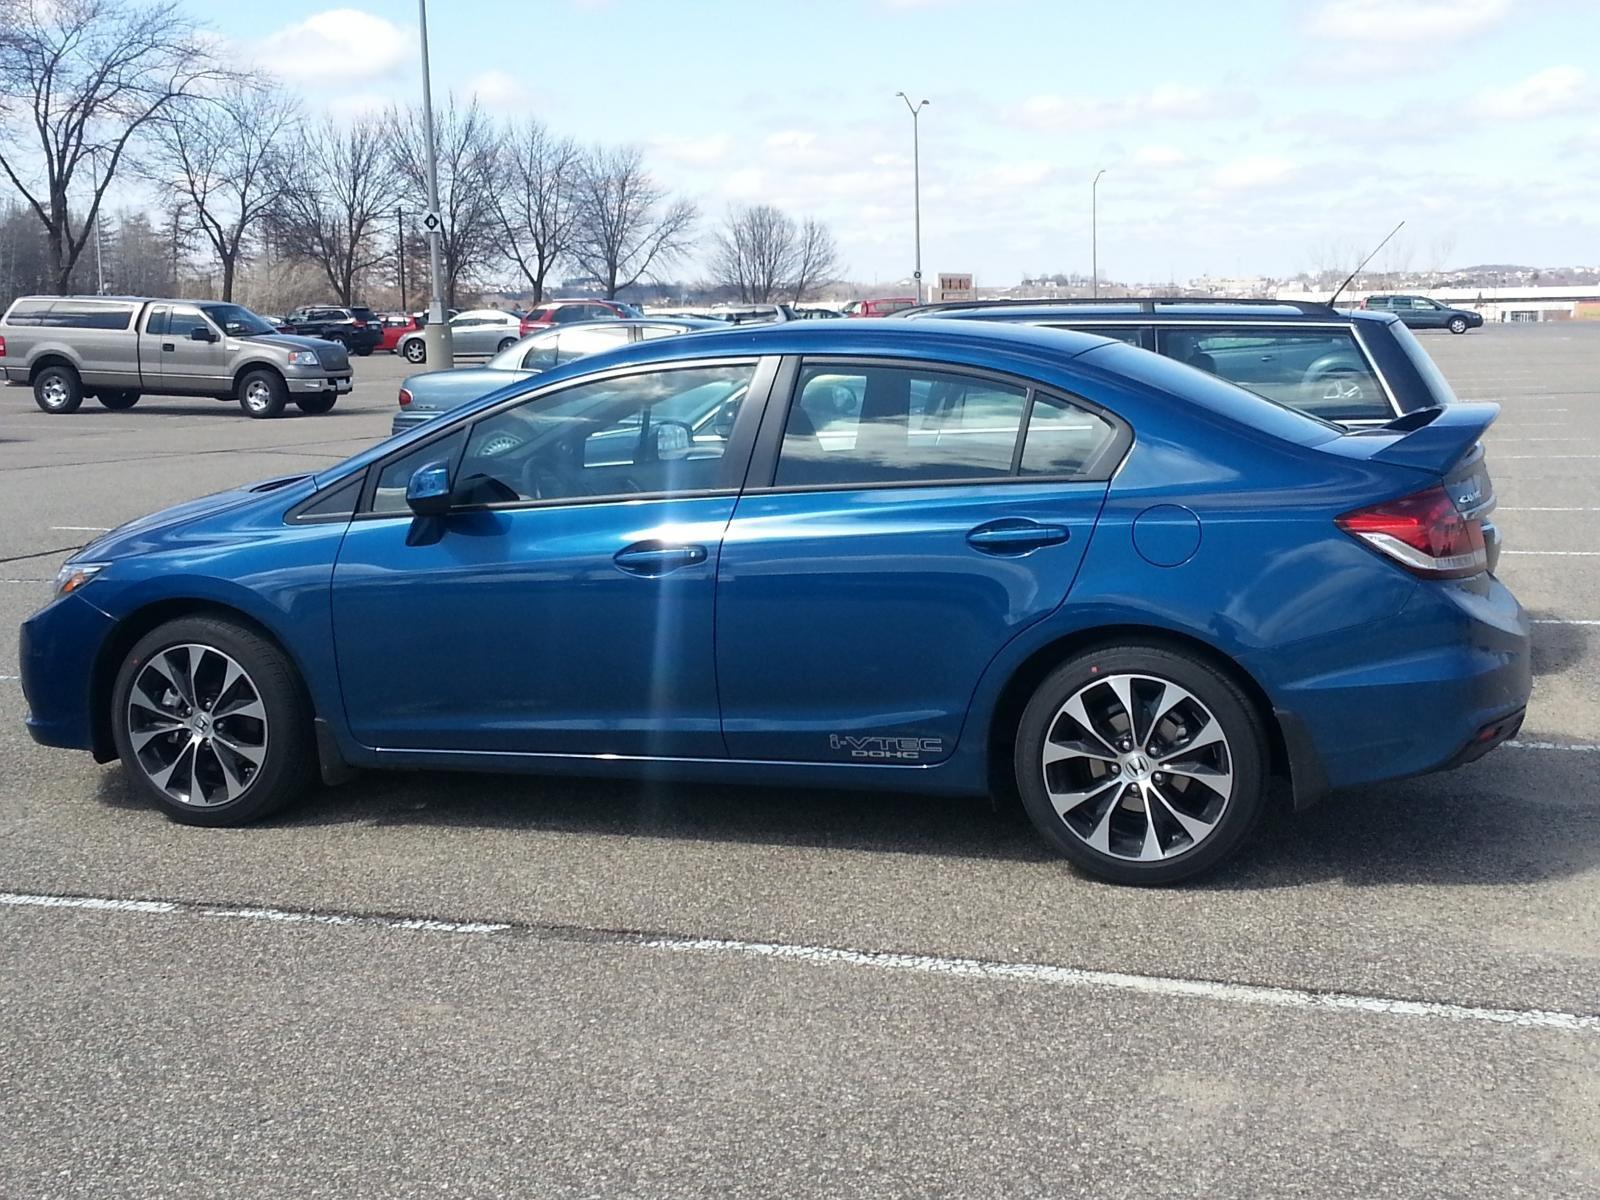 New '13 Civic Si Owner!-20130416_144301.jpg